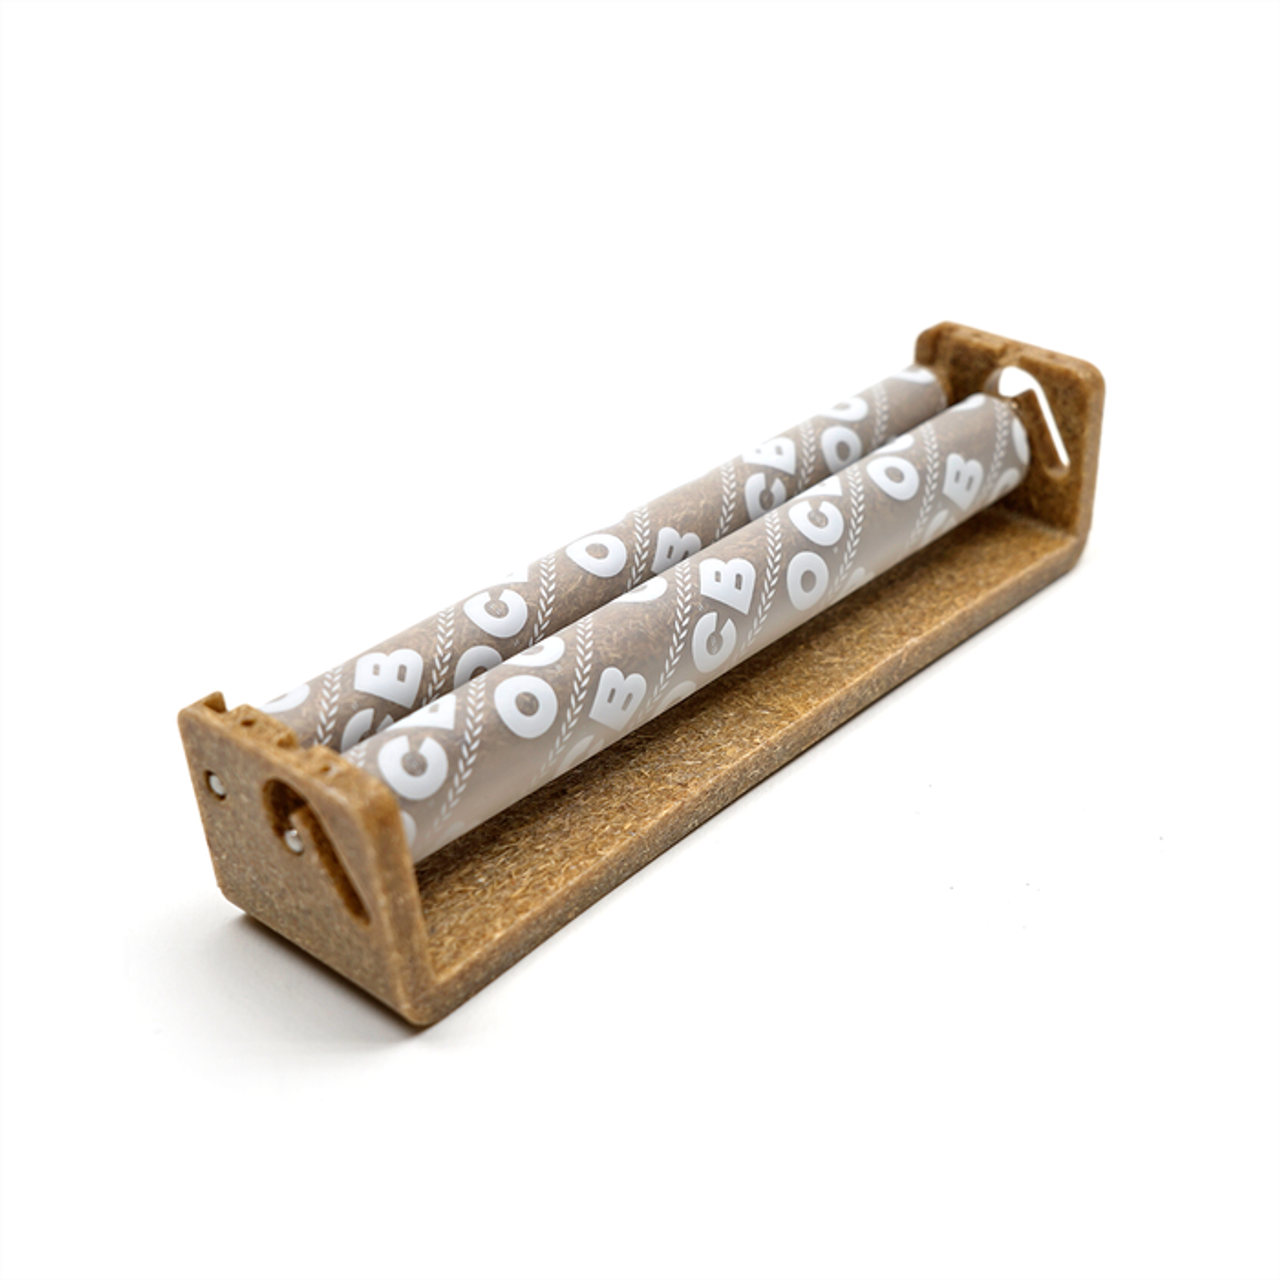 OCB - Wood Composite Roller - Sizes